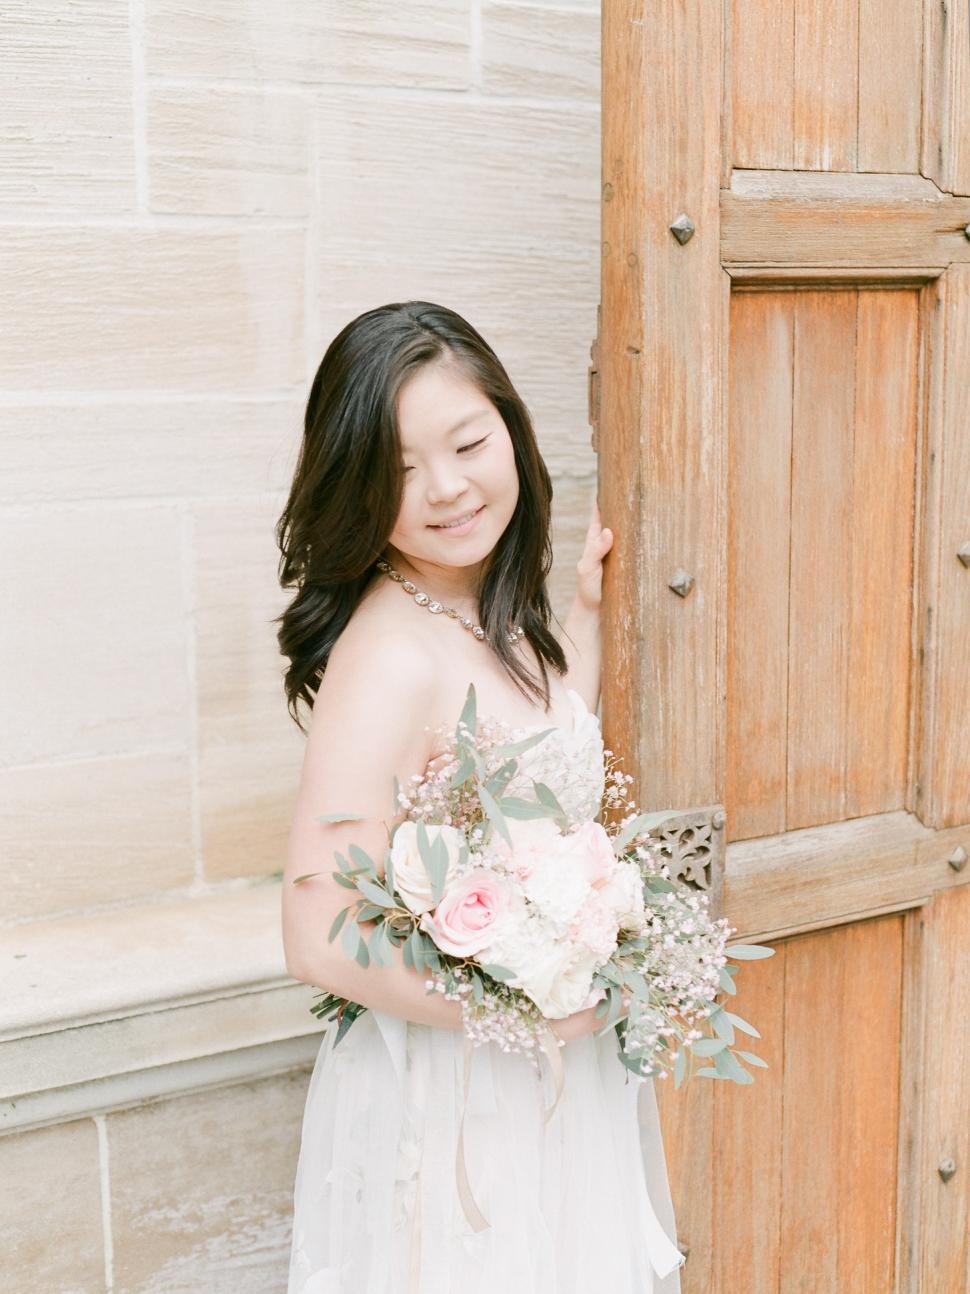 Southern-California-Wedding-Photographer-Cassi-Claire-Greystone-Mansion-Beverly-Hills-CA-wedding_24.jpg